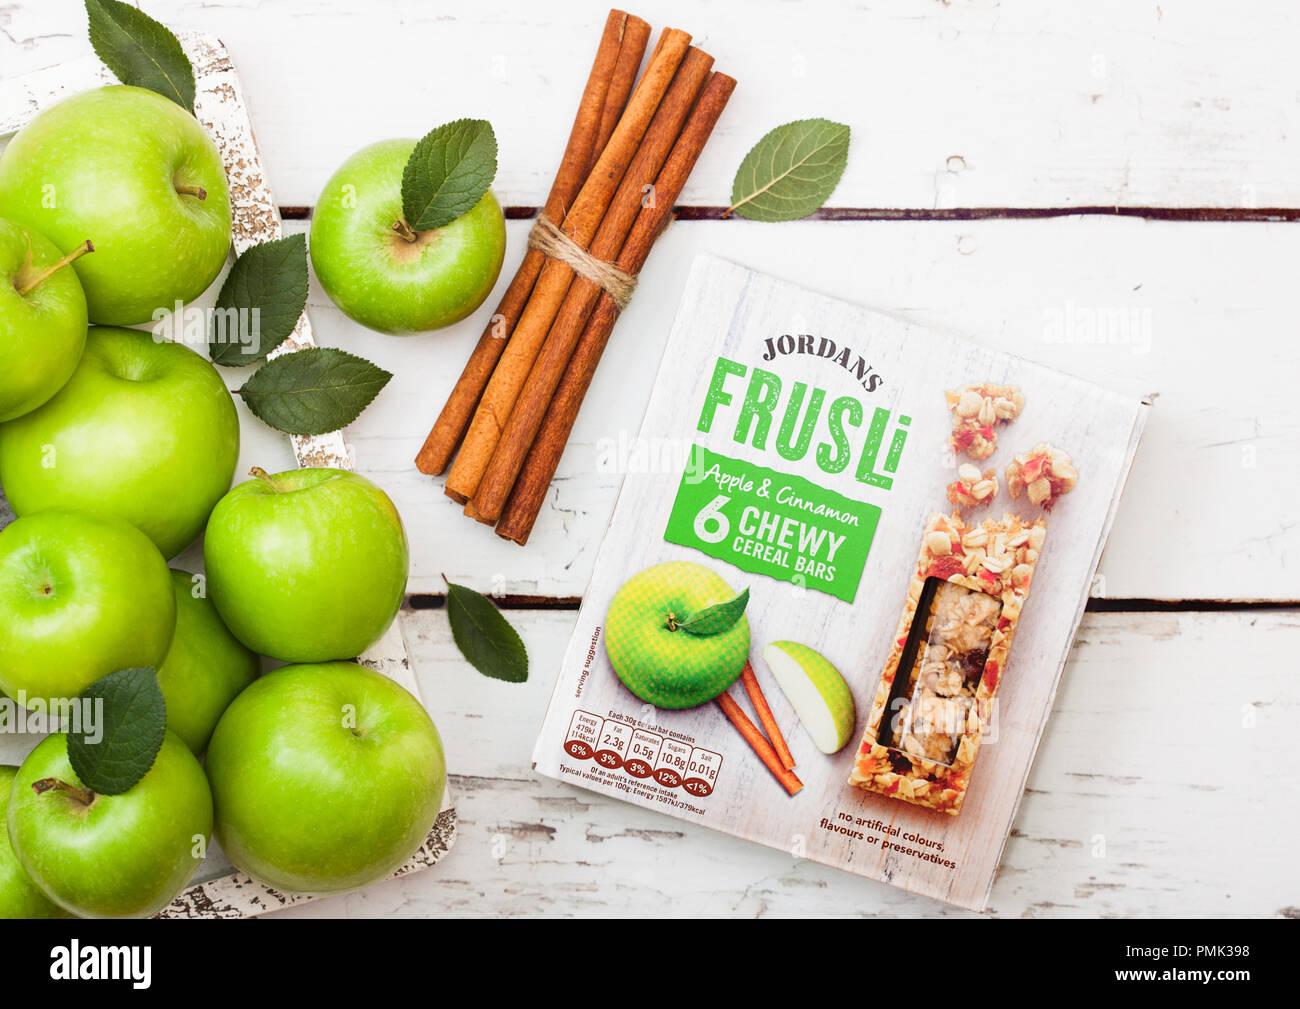 c54a532f7f2 LONDON, UK - SEPTEMBER 15, 2018: Box of Jordans Frusli with apple and  cinnamon taste with fresh apples.